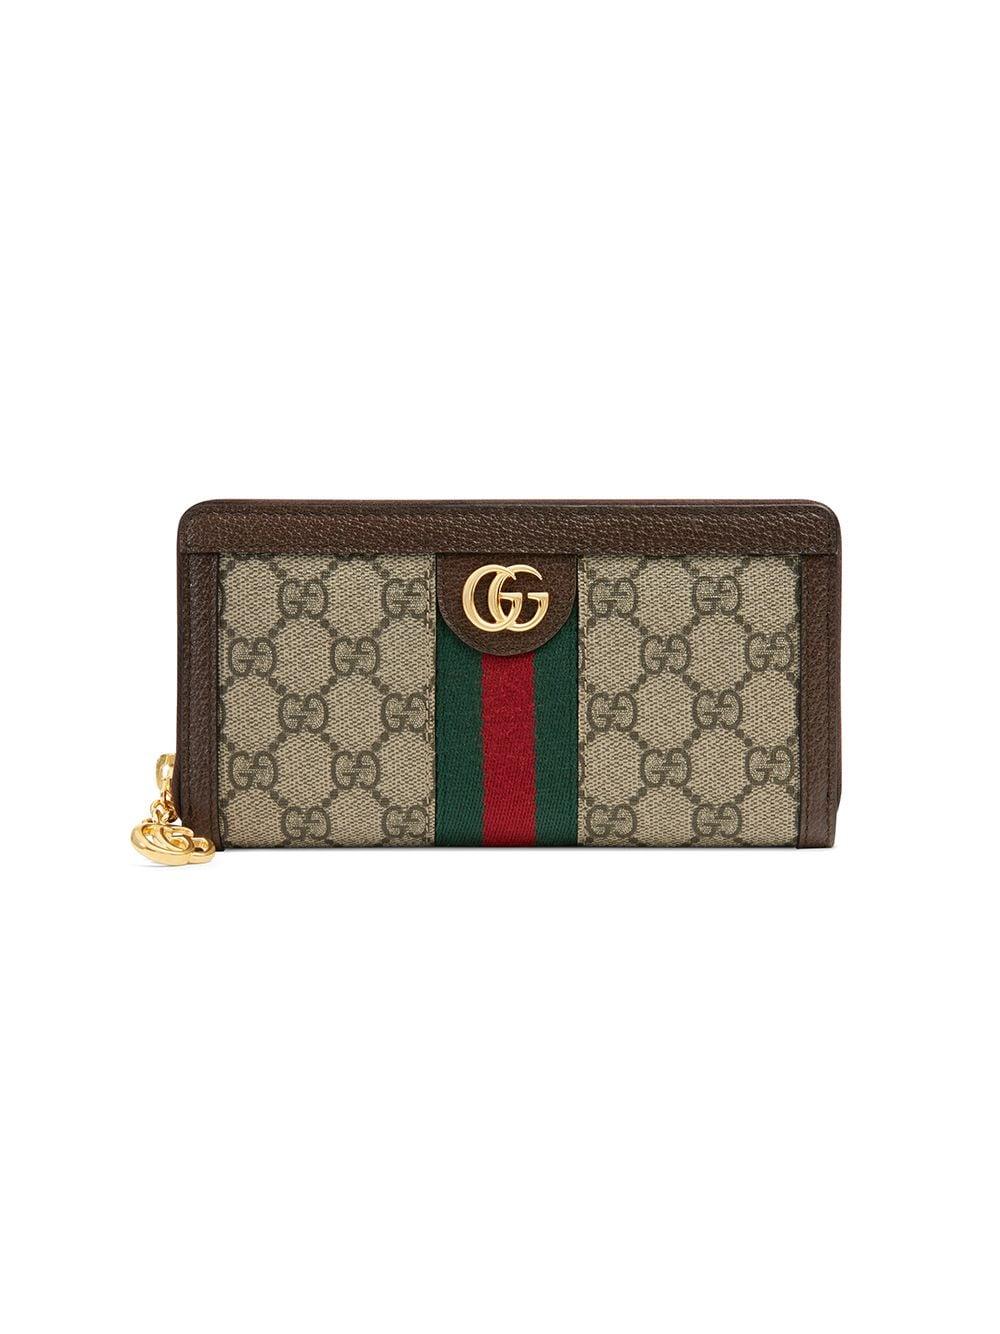 Gucci 'Ophidia' Portemonnaie - Nude